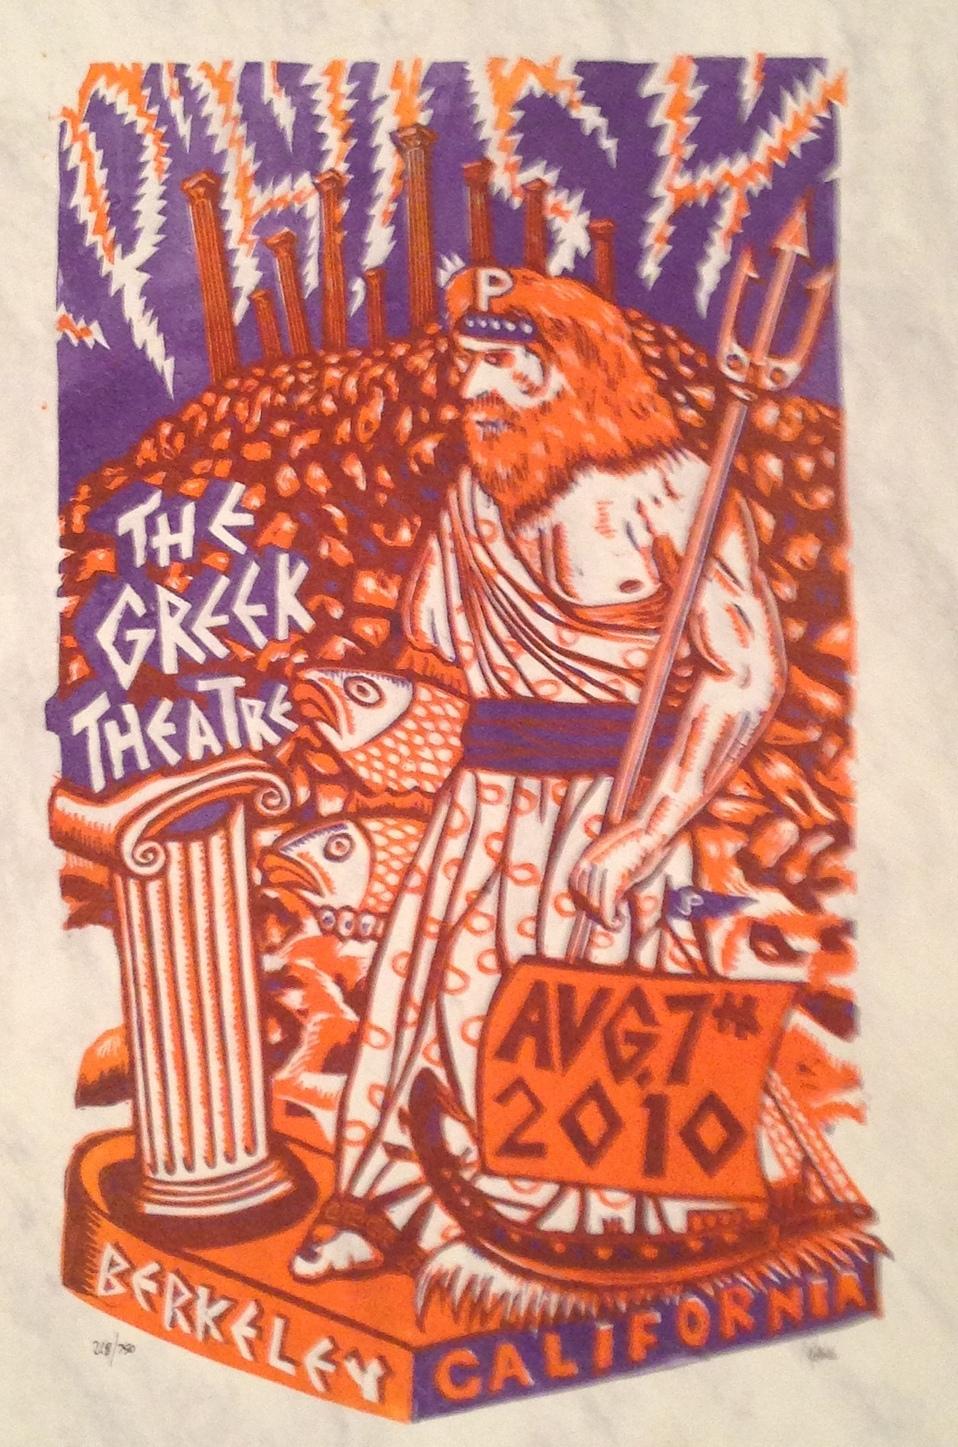 JIM POLLOCK  |  Phish - Greek Theatre